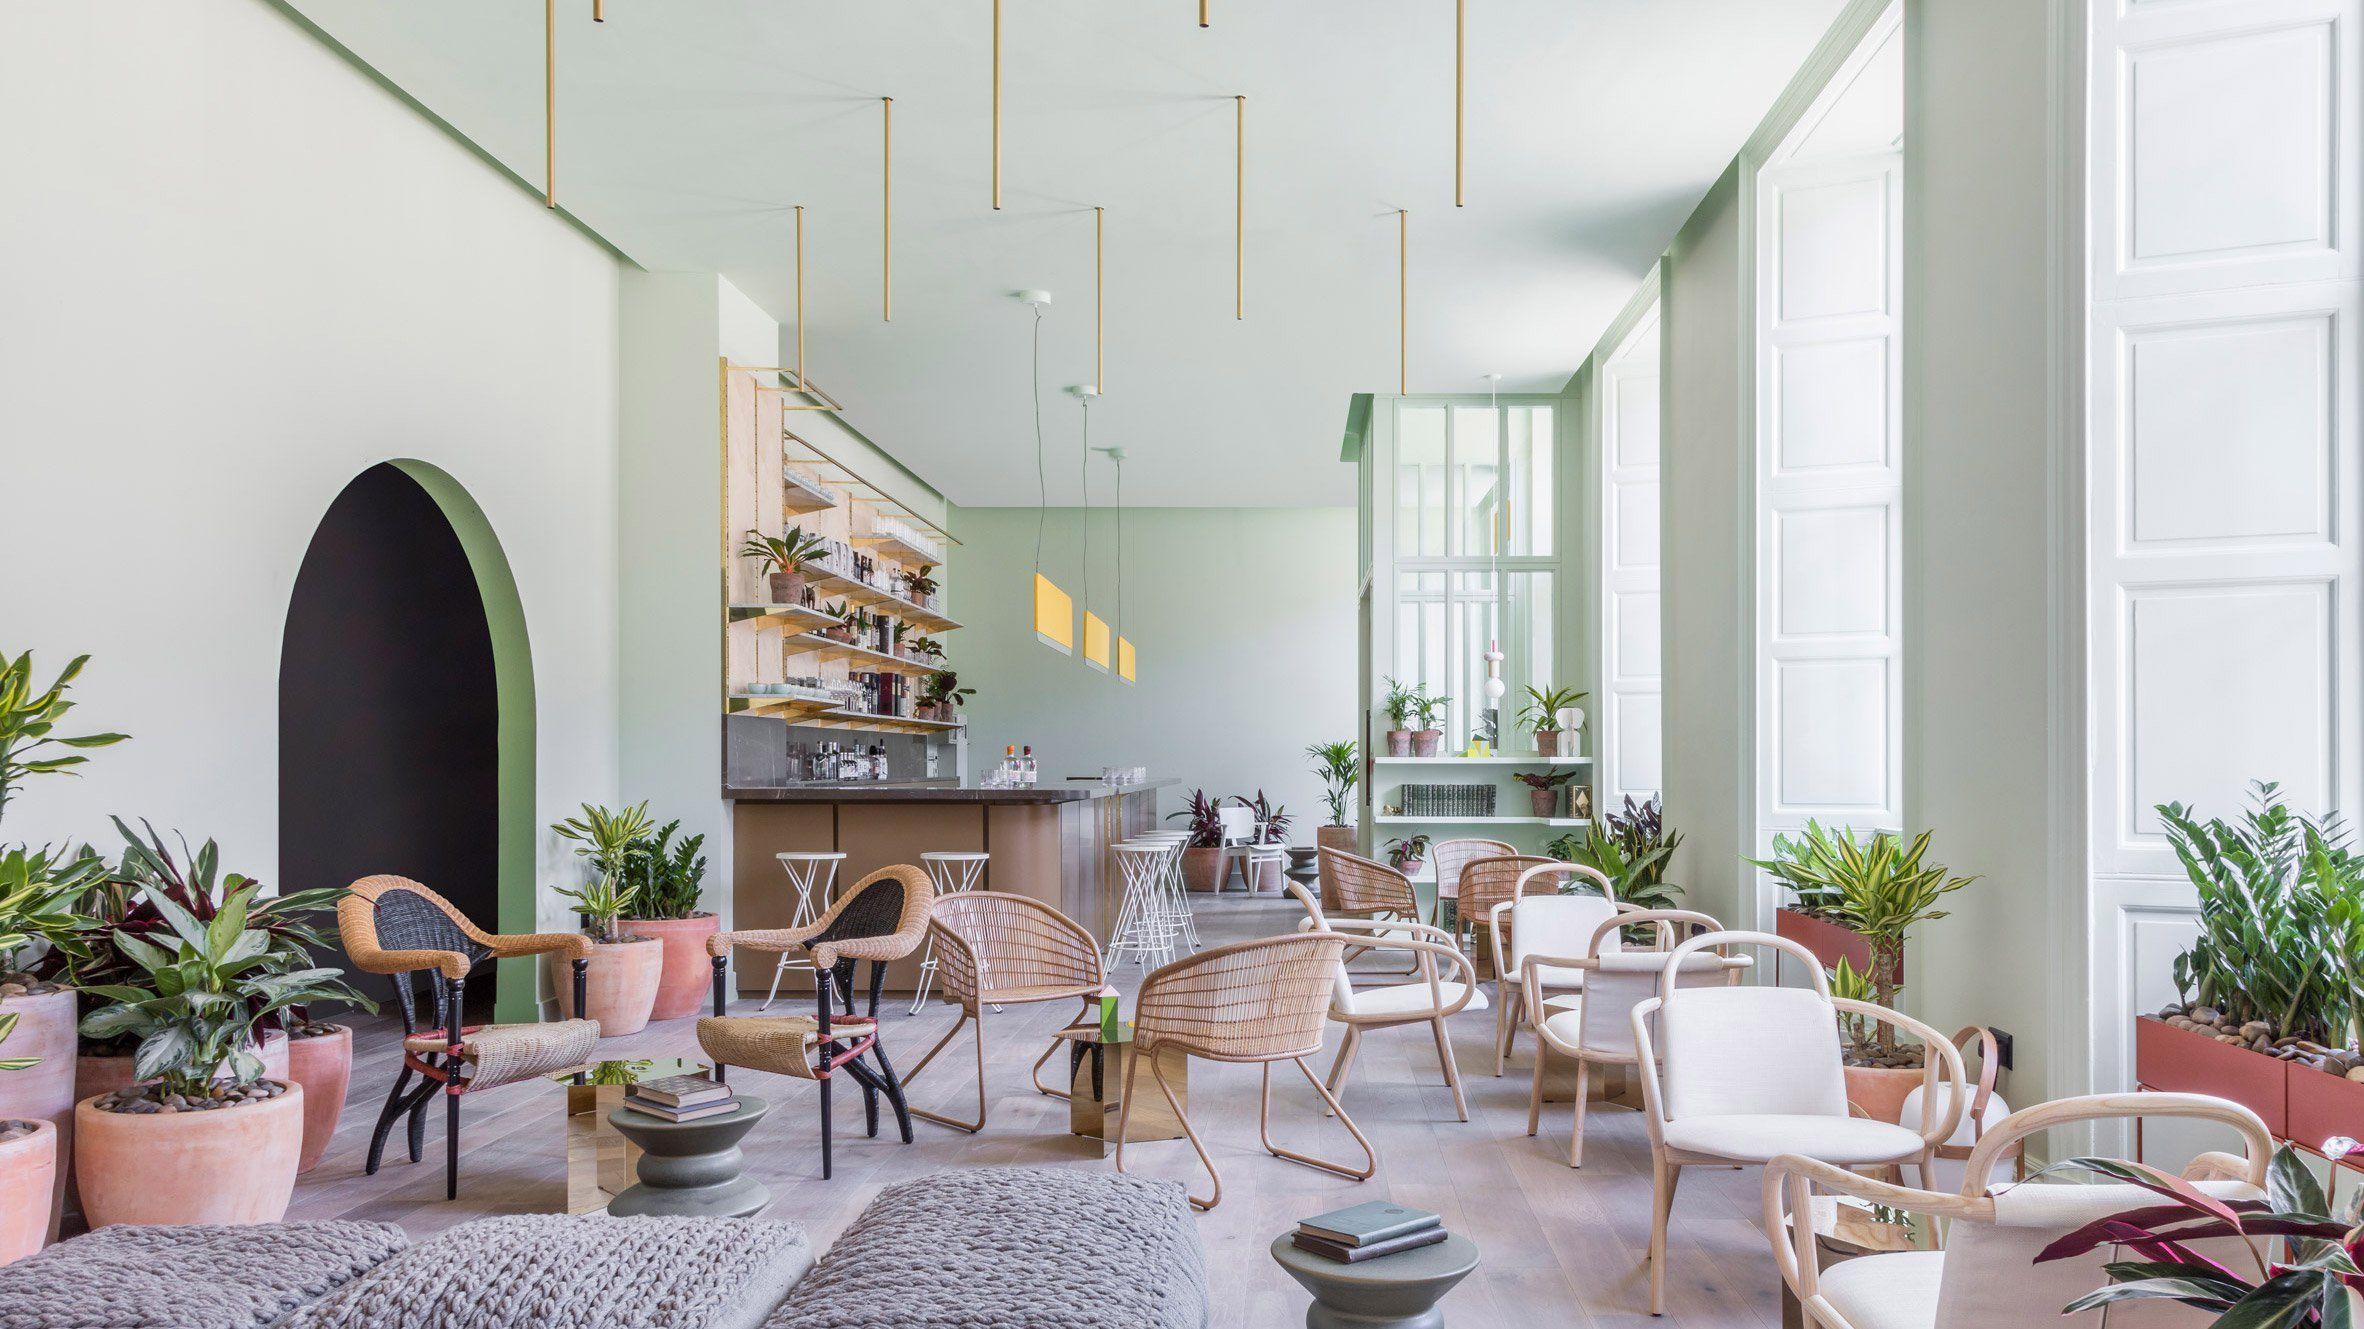 Grzywinski pons creates sophisticatedly tropical for Design hotel eden